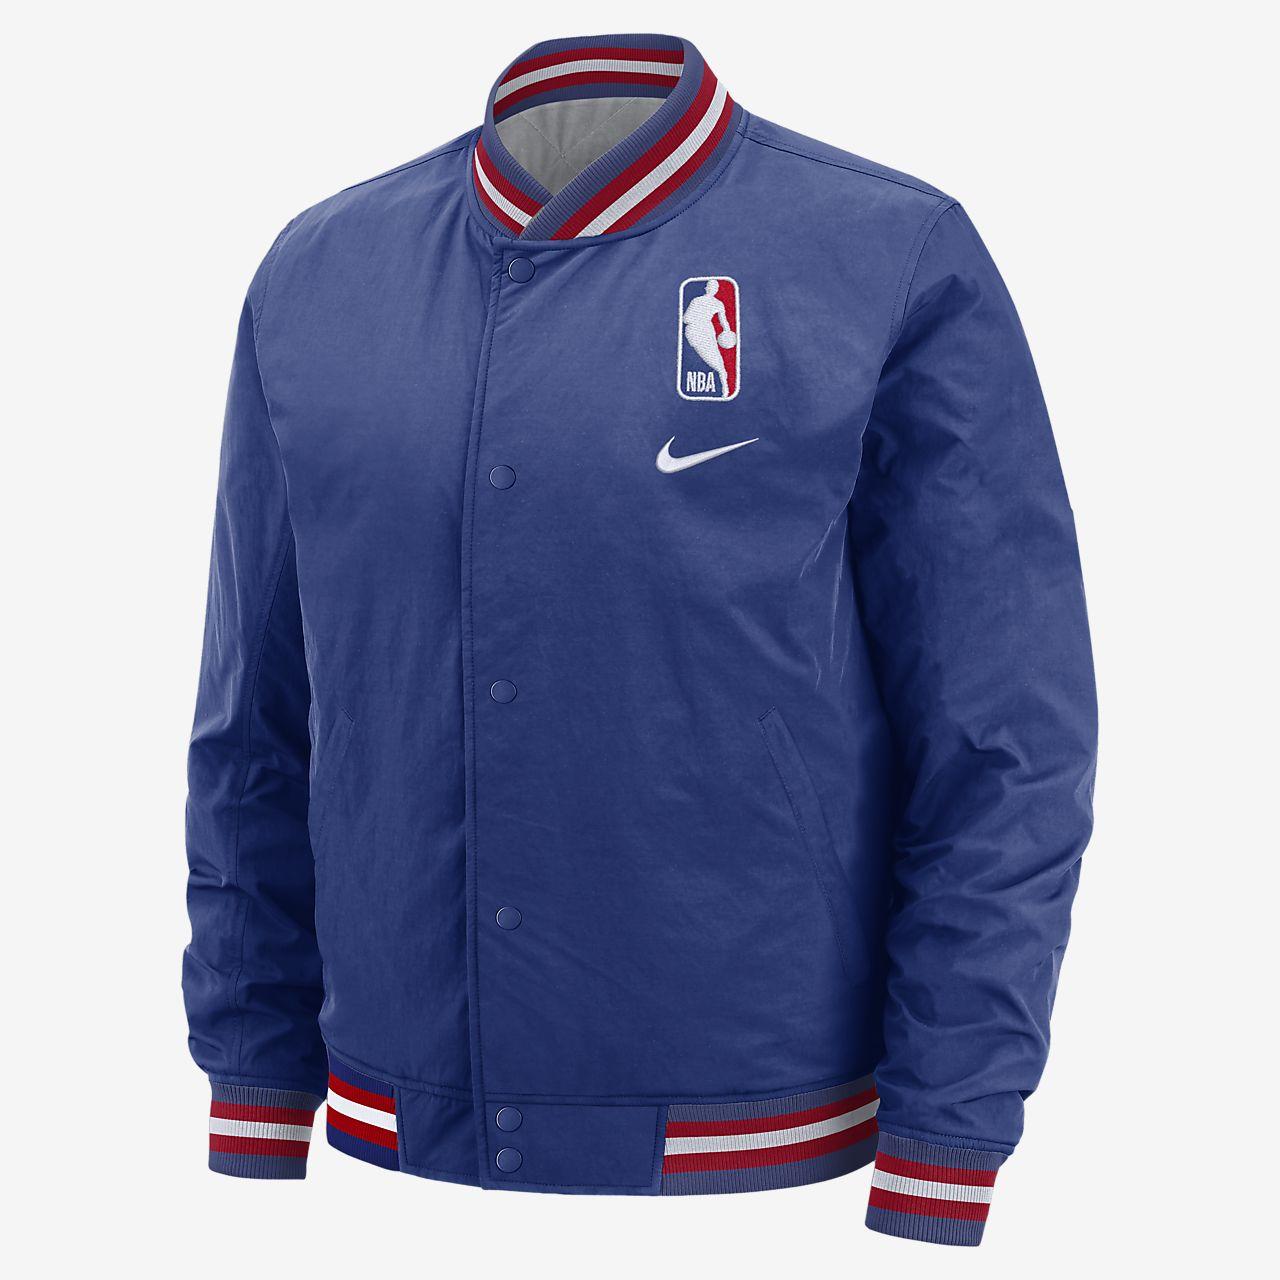 Team 31 Courtside Men's Nike NBA Jacket